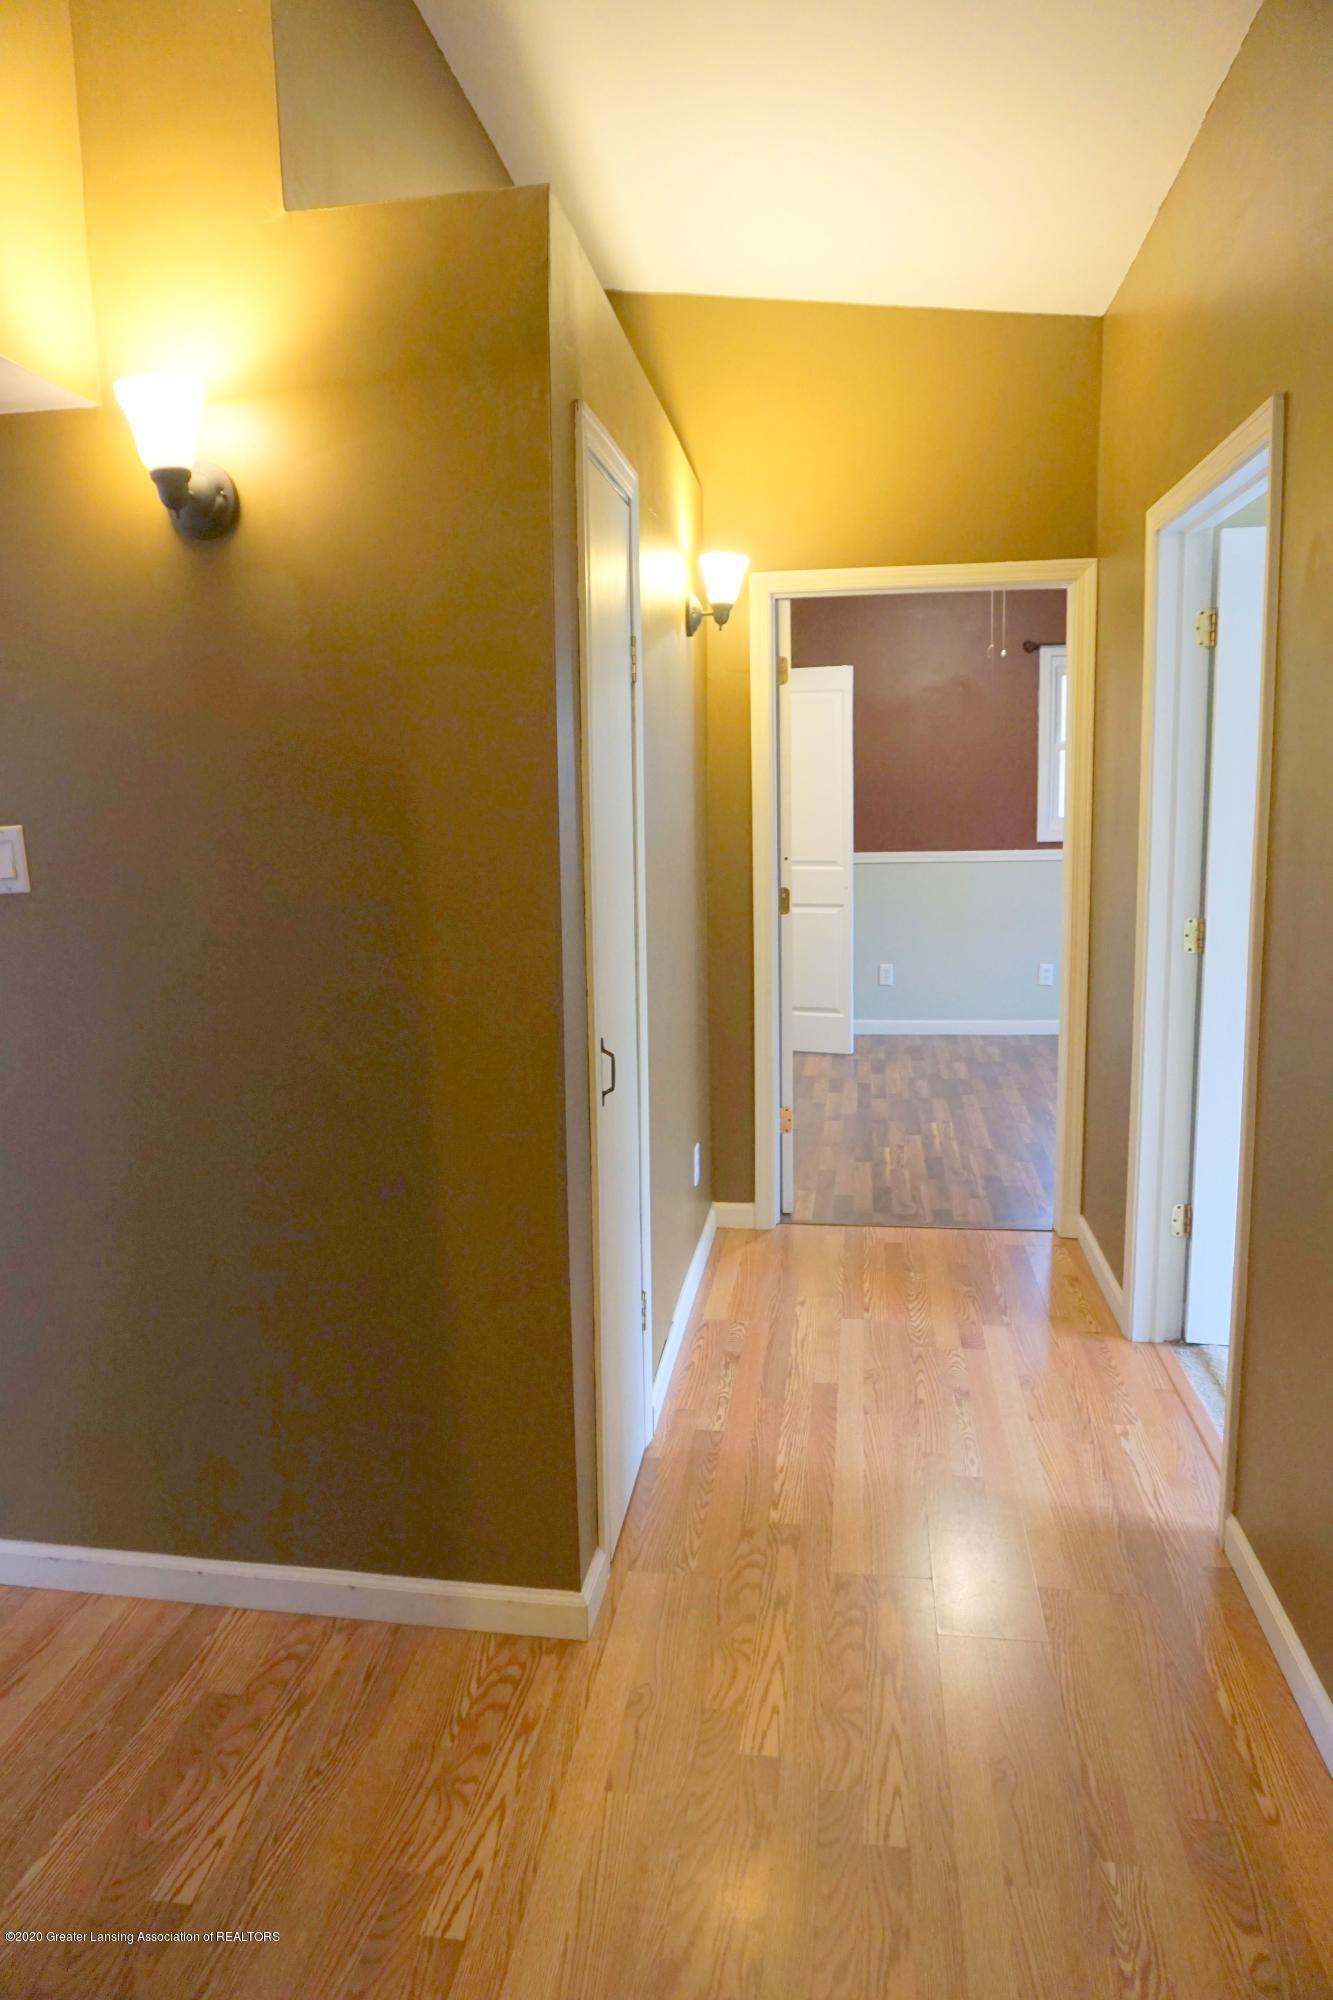 11950 Woodbury Rd - Hallway into BR2 and 3 - 13